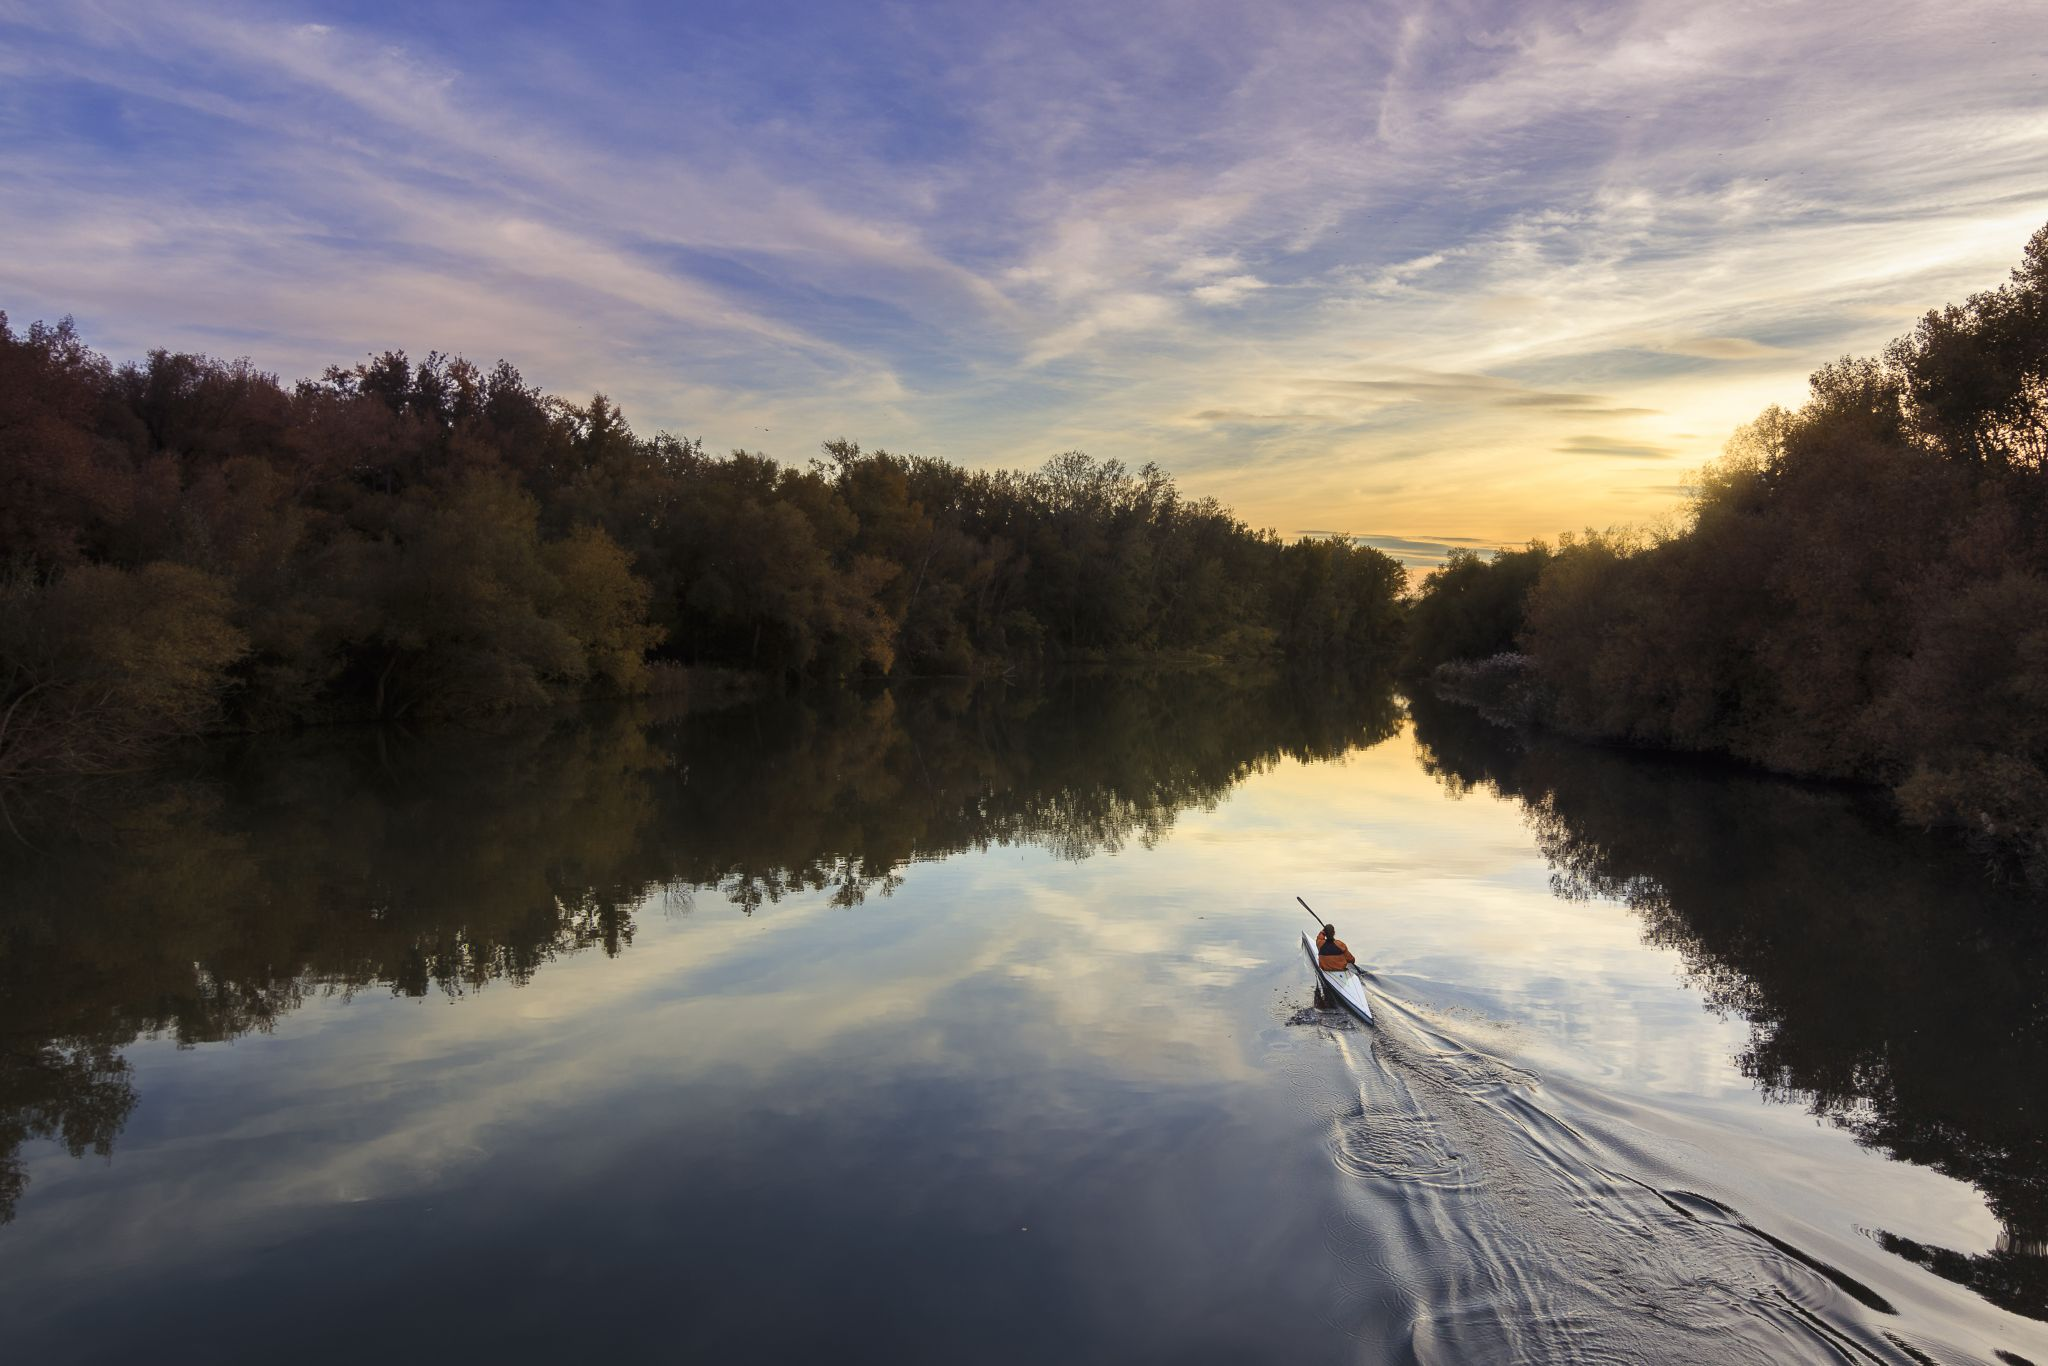 Segre river at Mitjana Park in Lleida (Spain), Spain